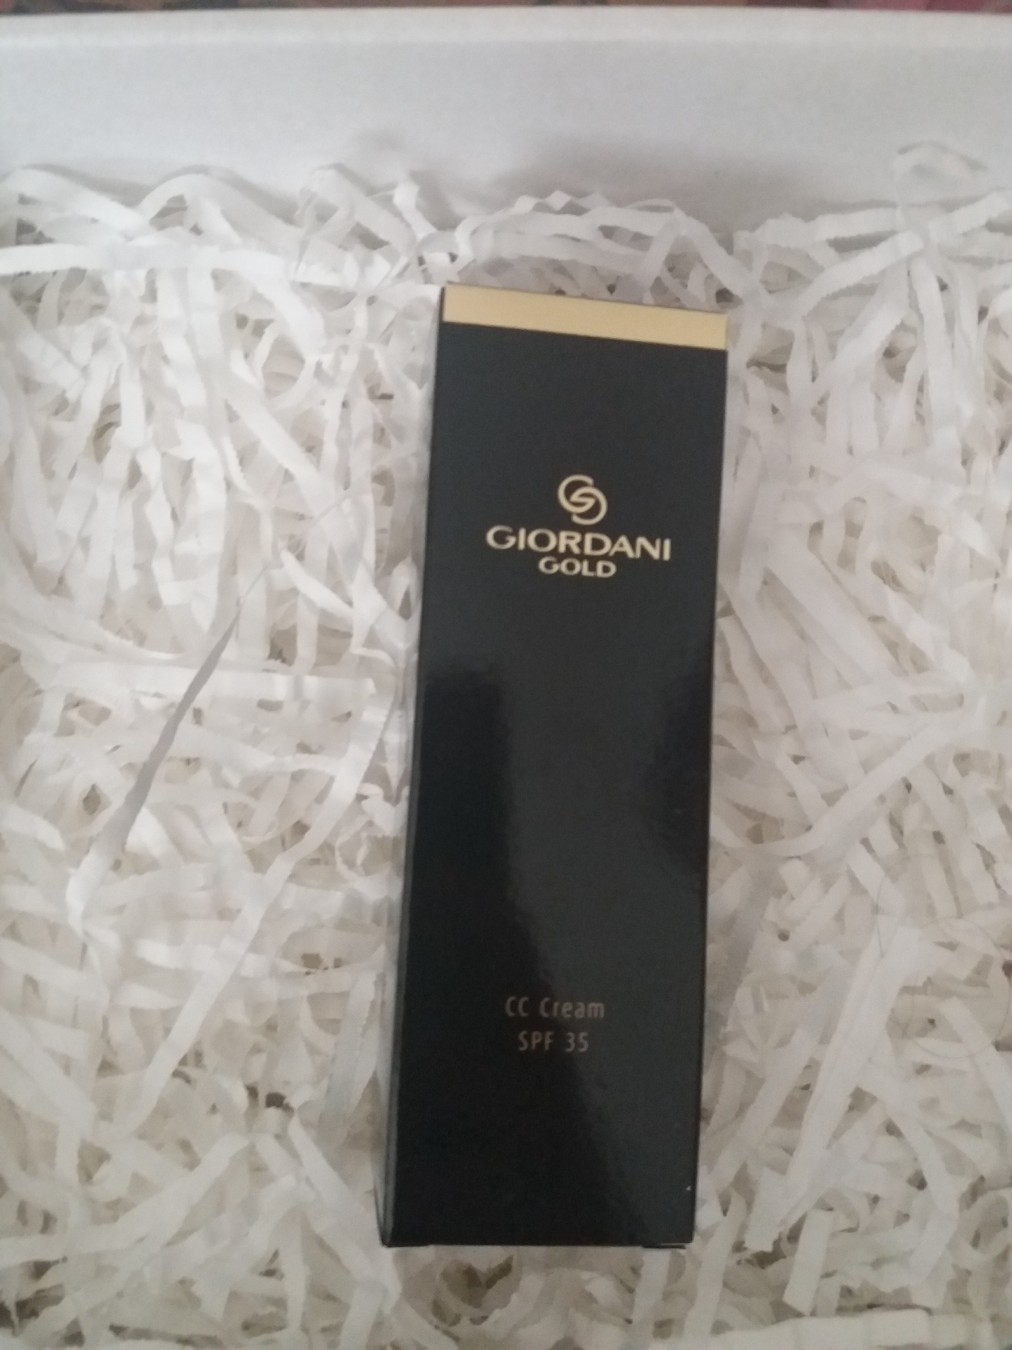 Giordani Gold Cc Krena Memories Toaletna Voda I Kupka 68307113 Cream Spf 35